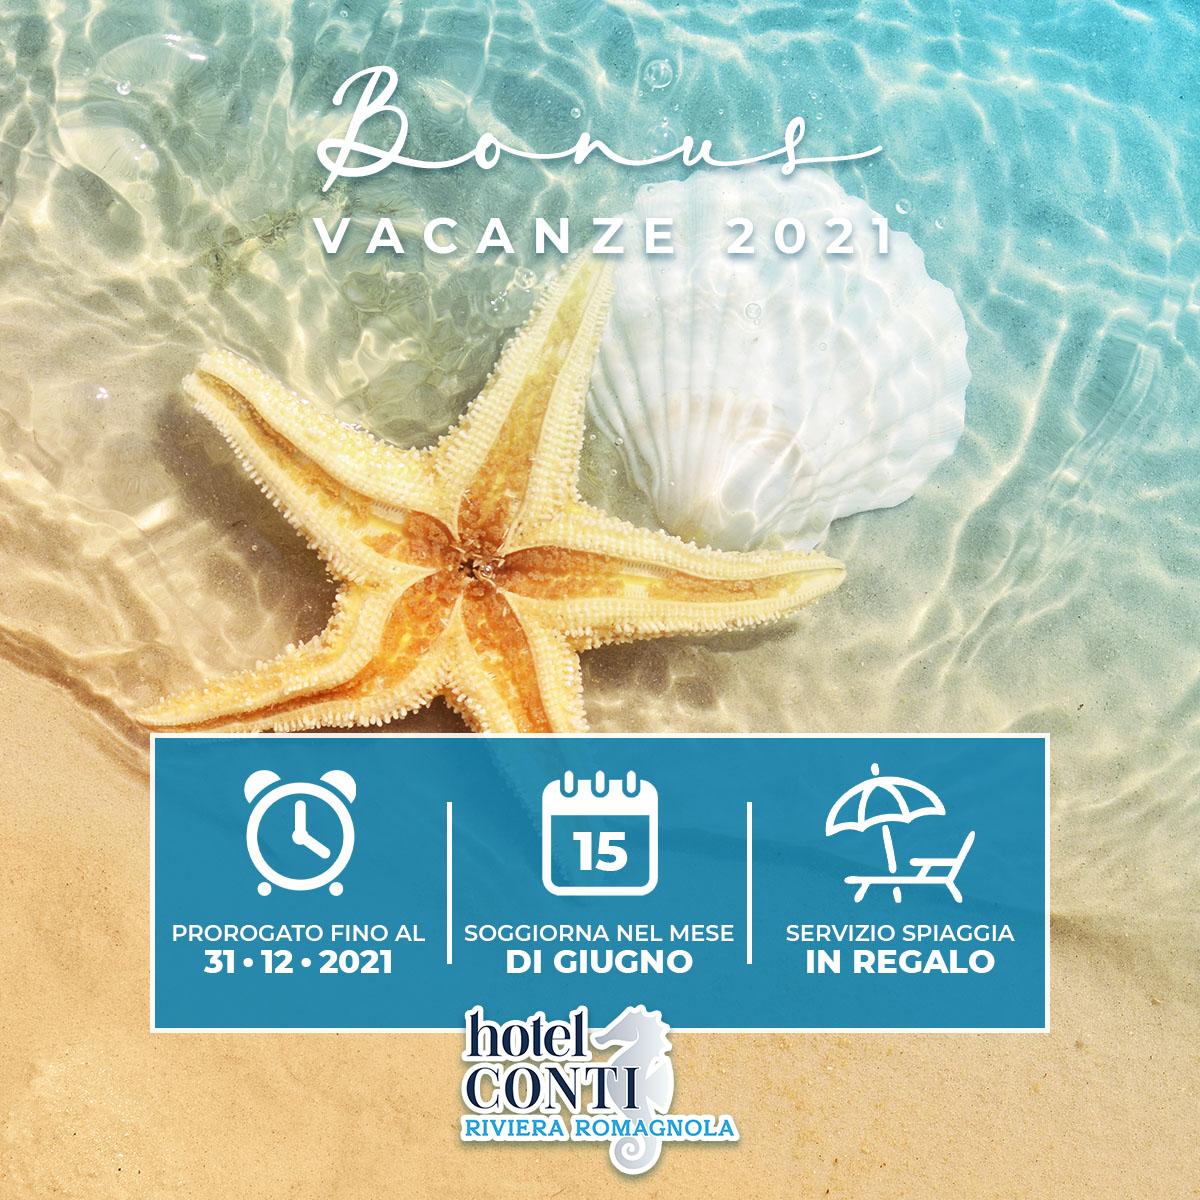 proroga bonus vacanze 2021